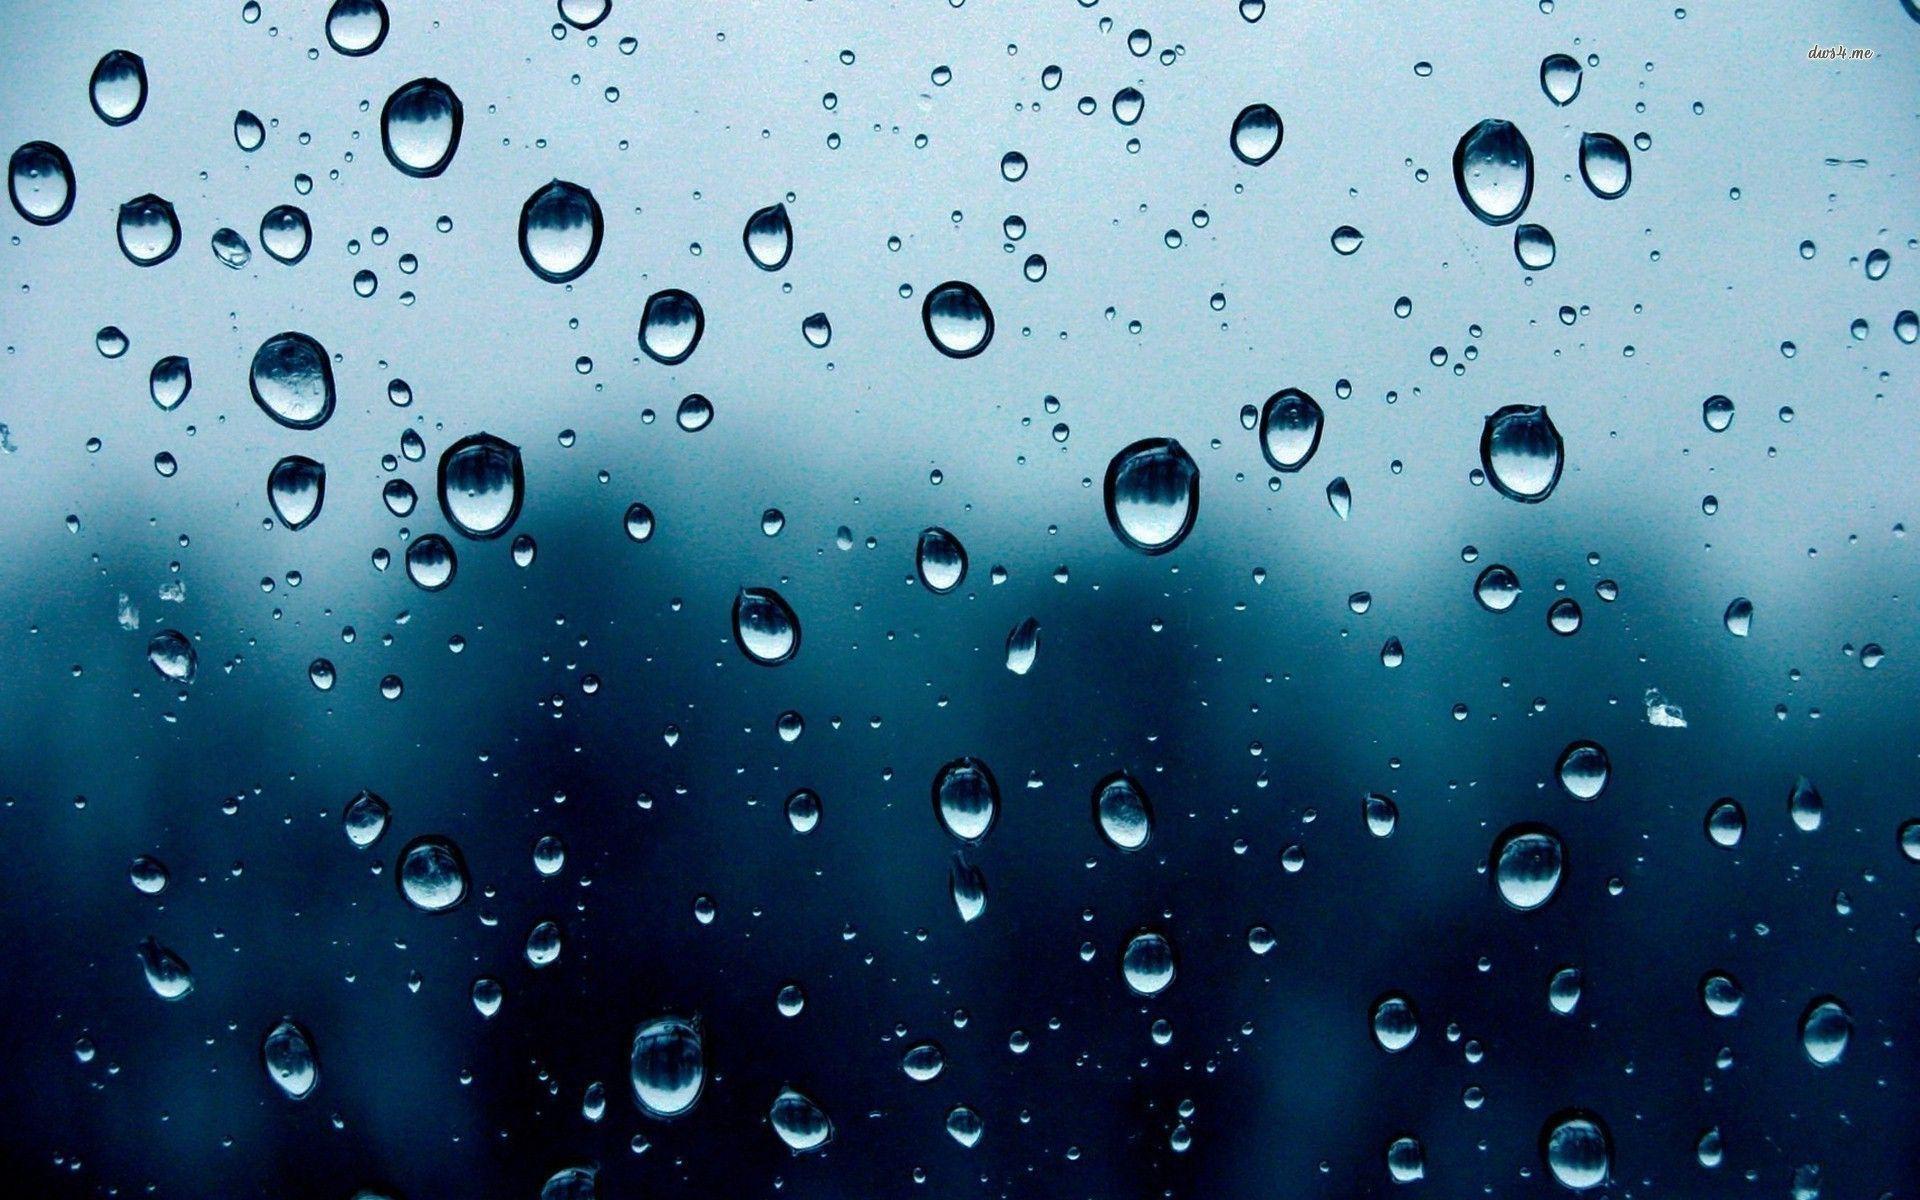 HD Rain Drops